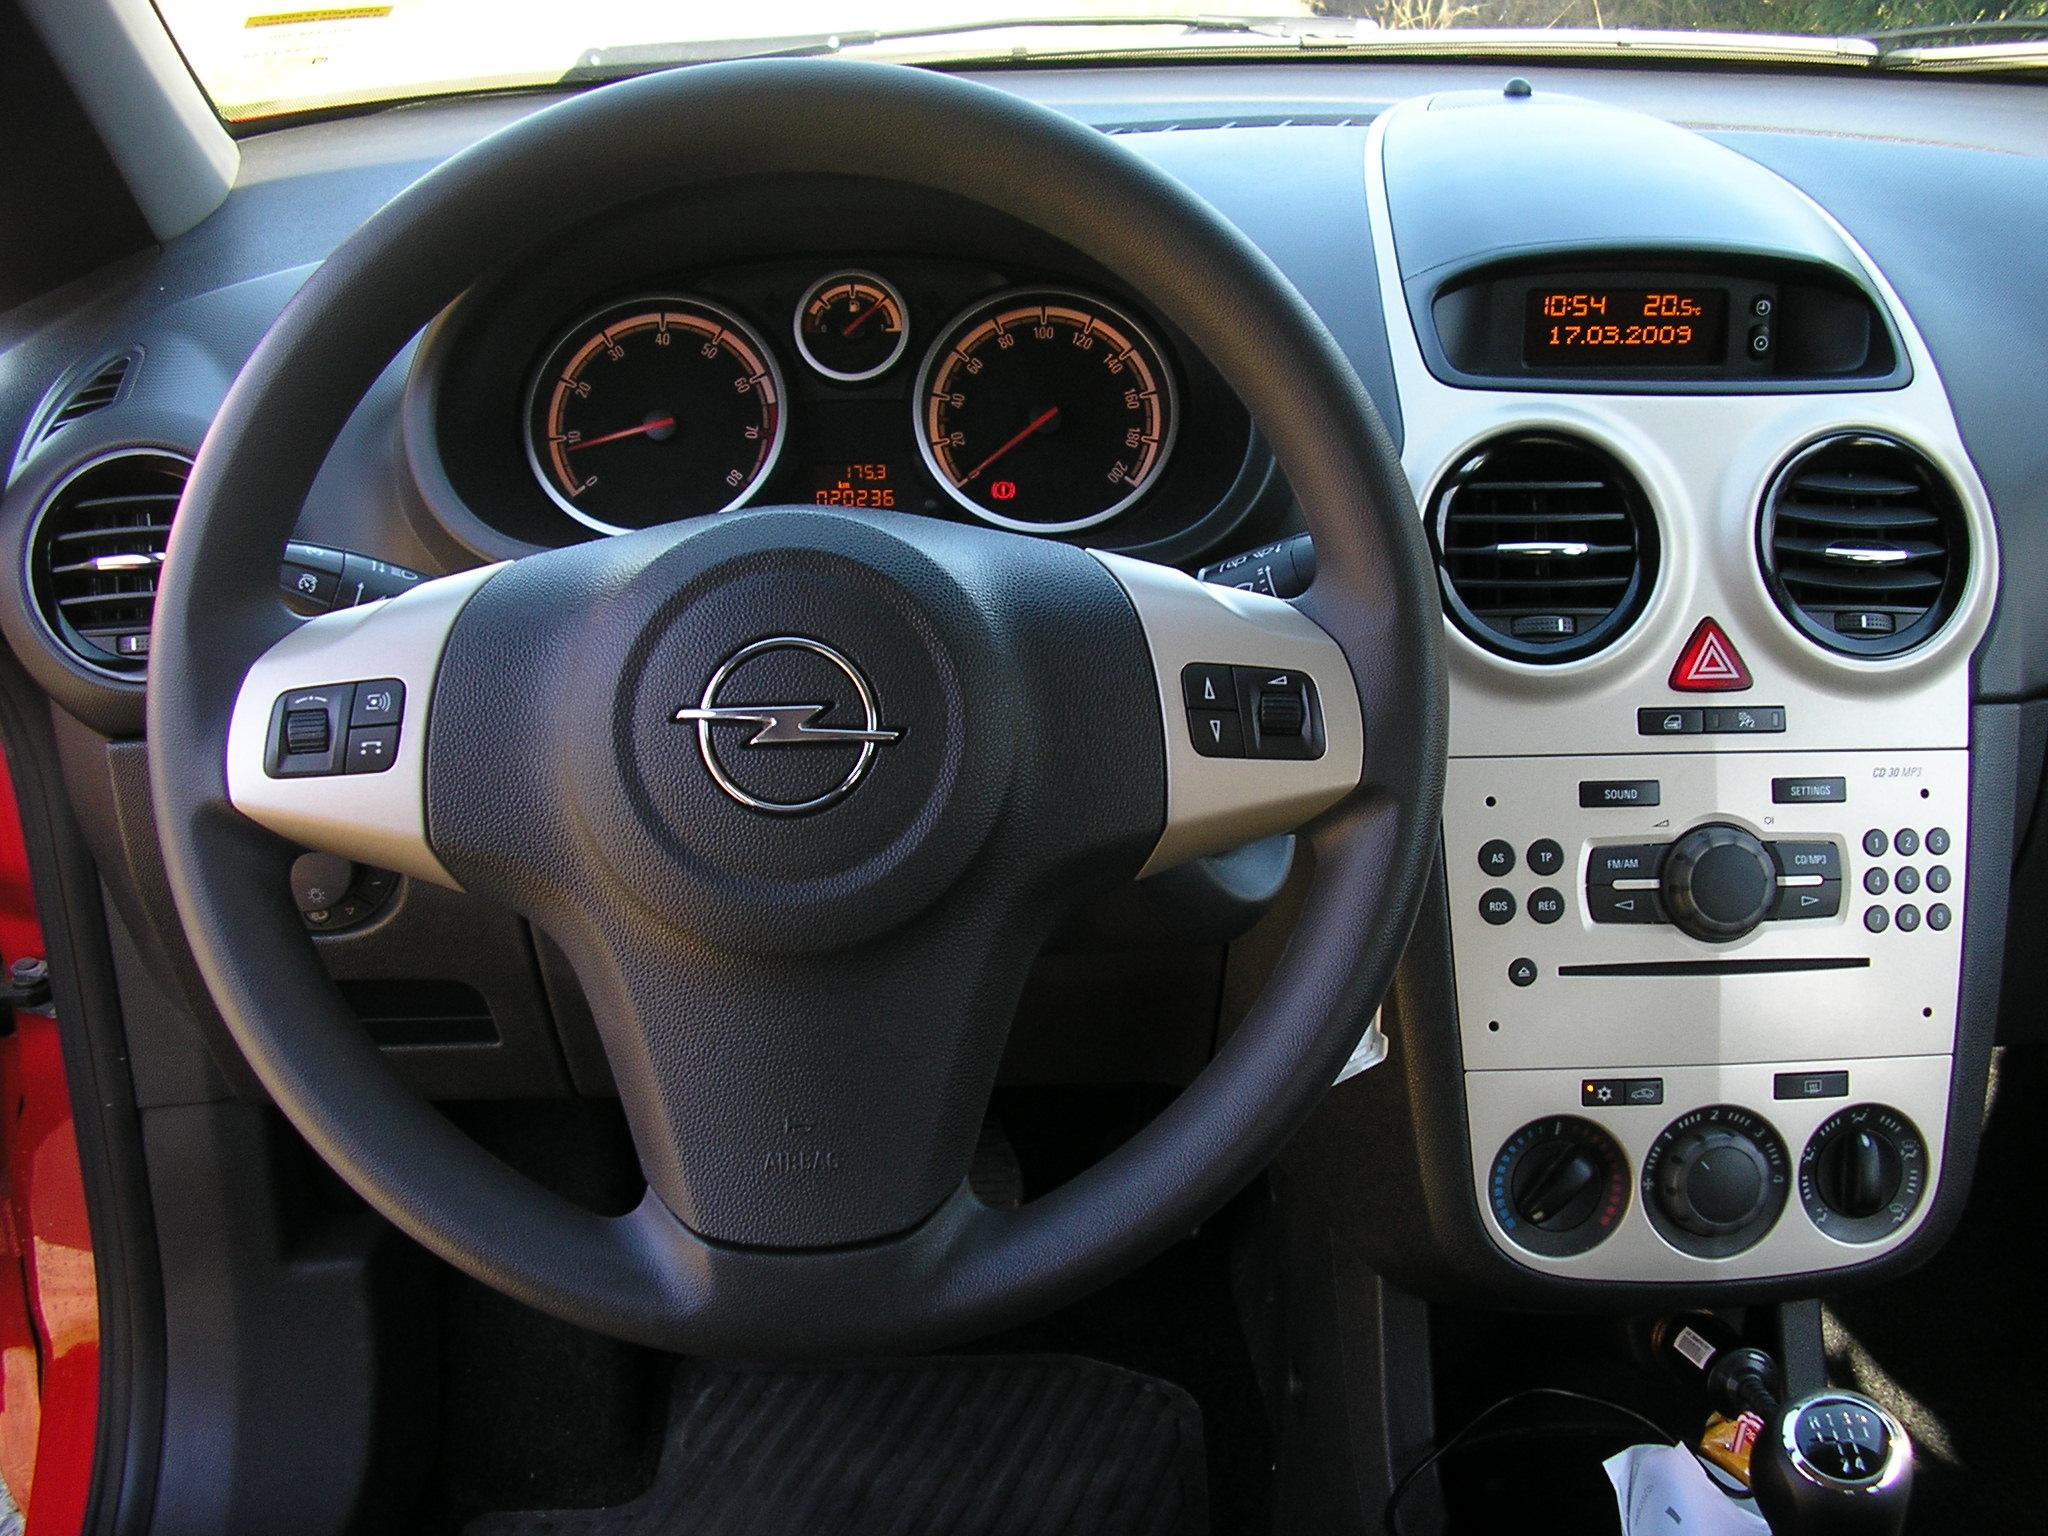 Awesome Interieur Opel Corsa D Photos - Ideeën Voor Thuis ...